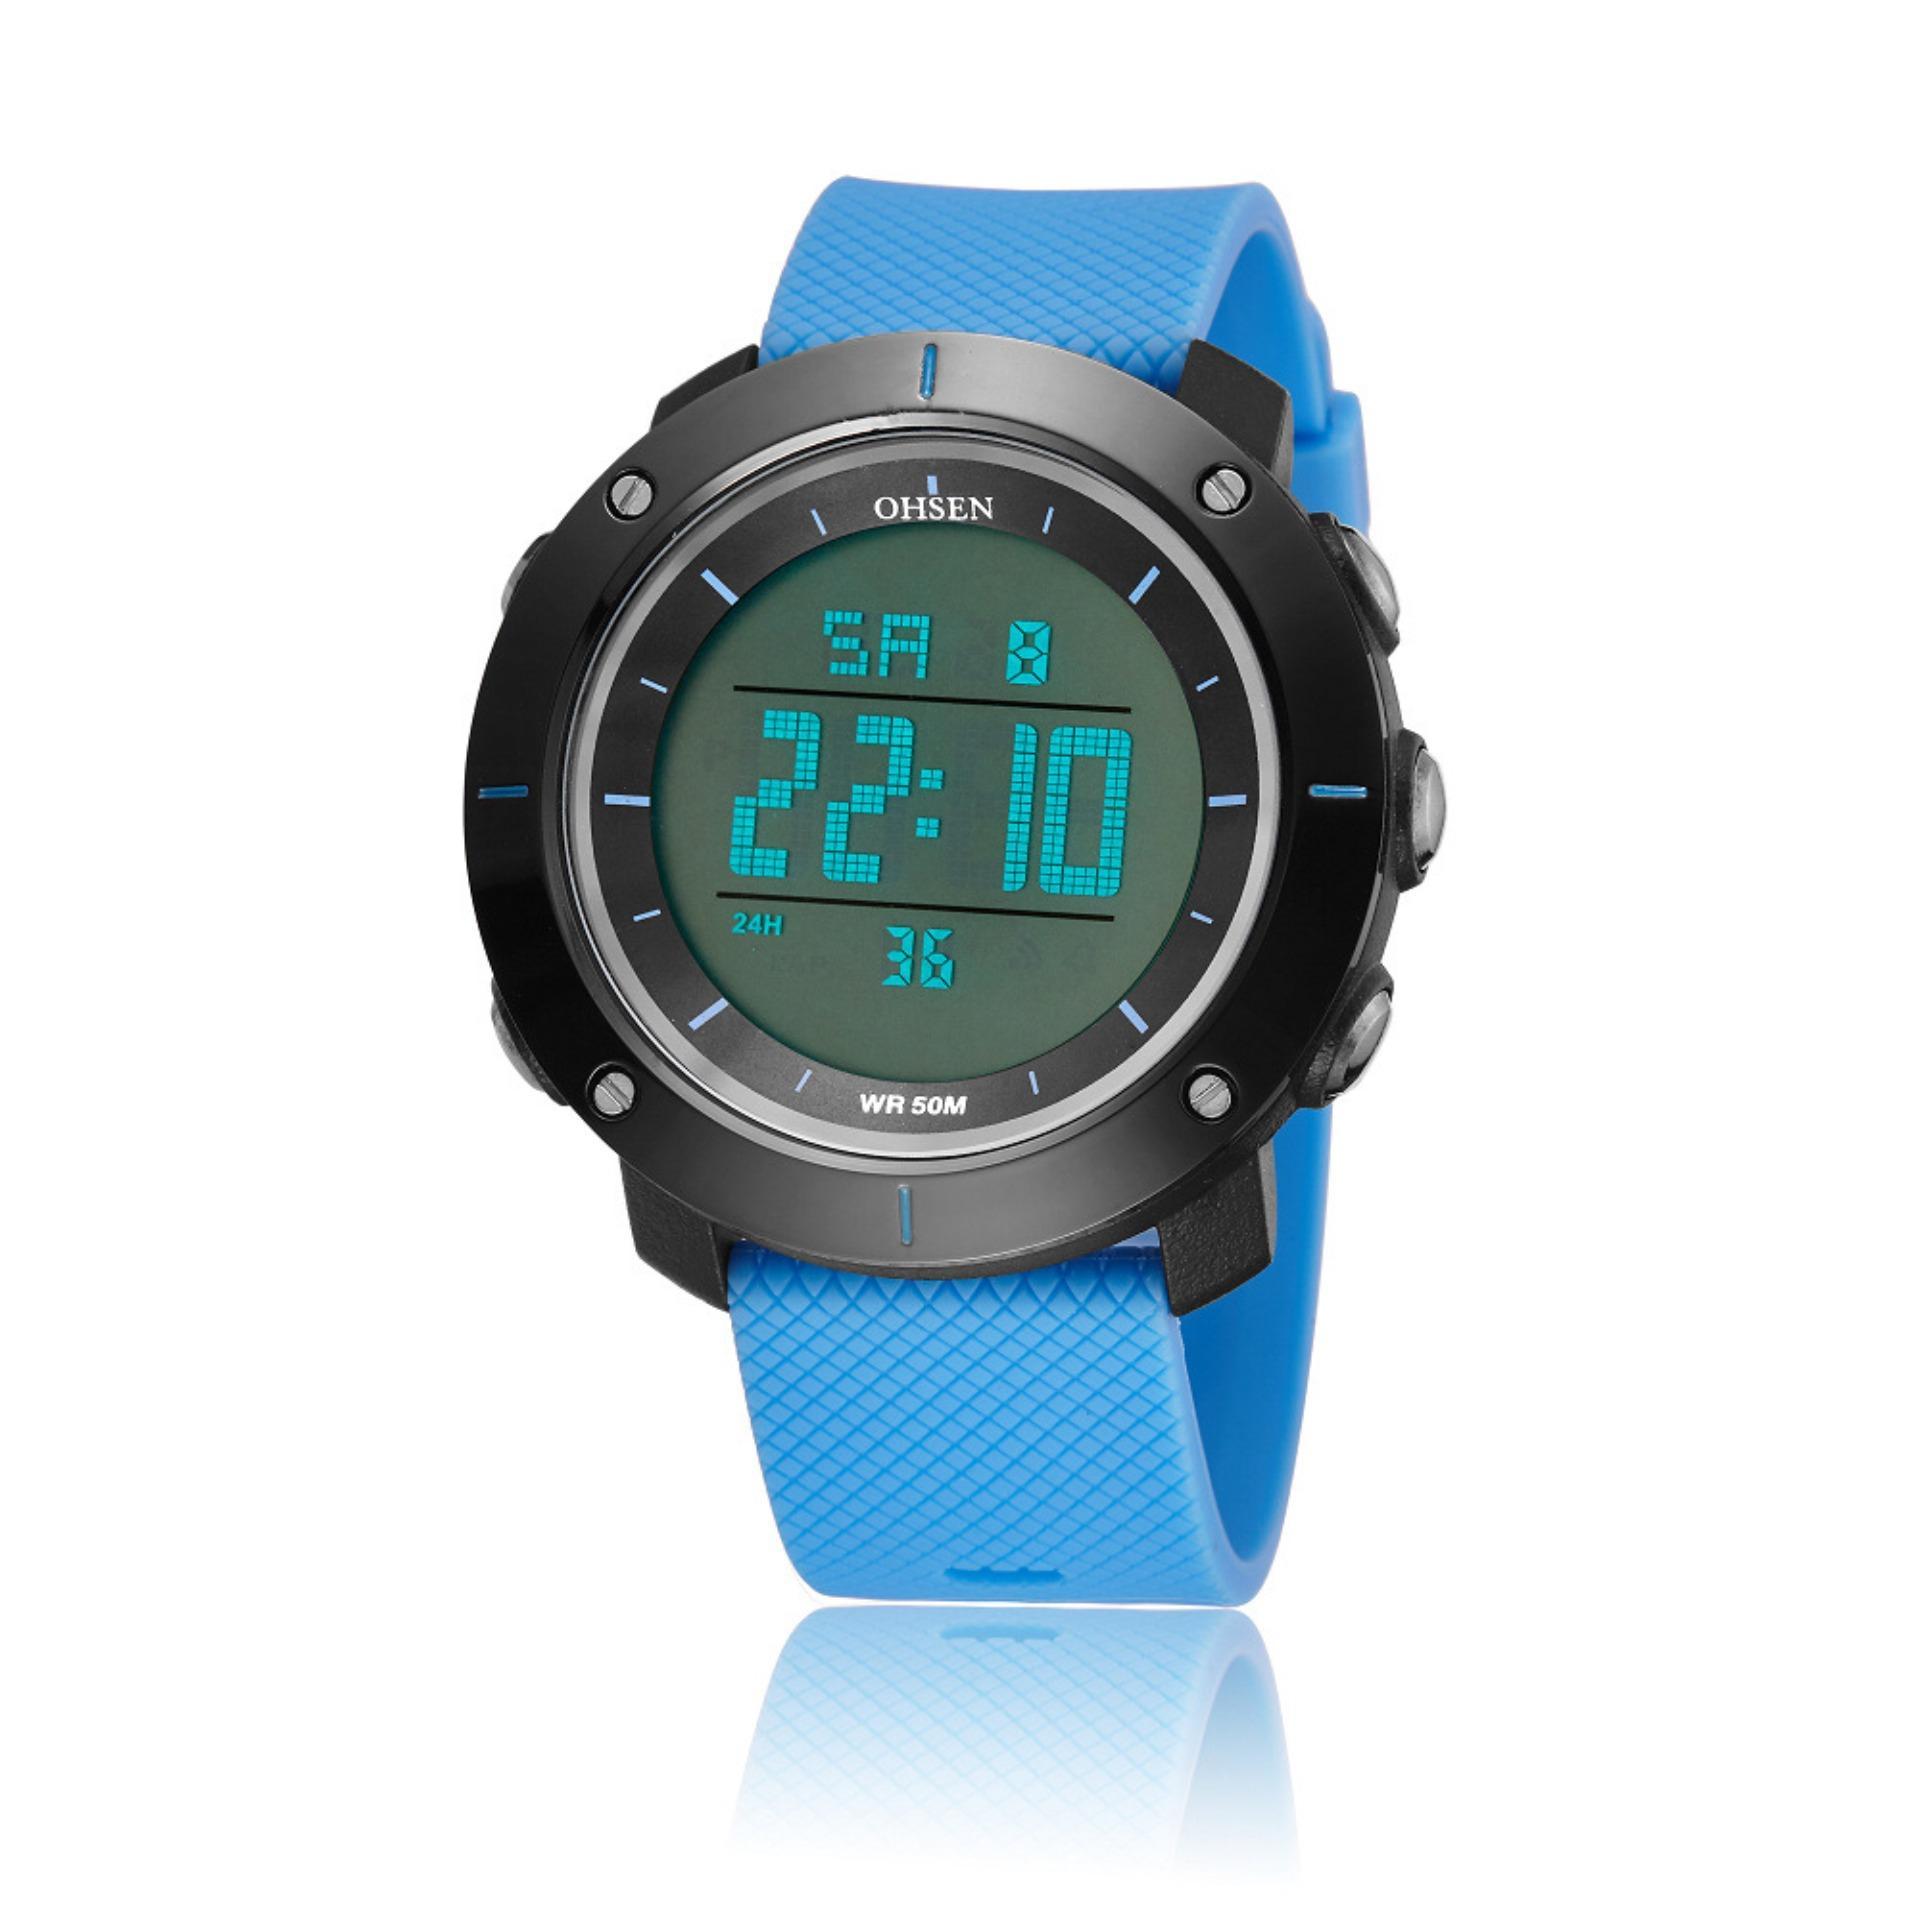 fba9788b248 Ohsen 1611 Men s Digital Time Sport Day Date Quartz Silicone Wrist Watch  (Blue)